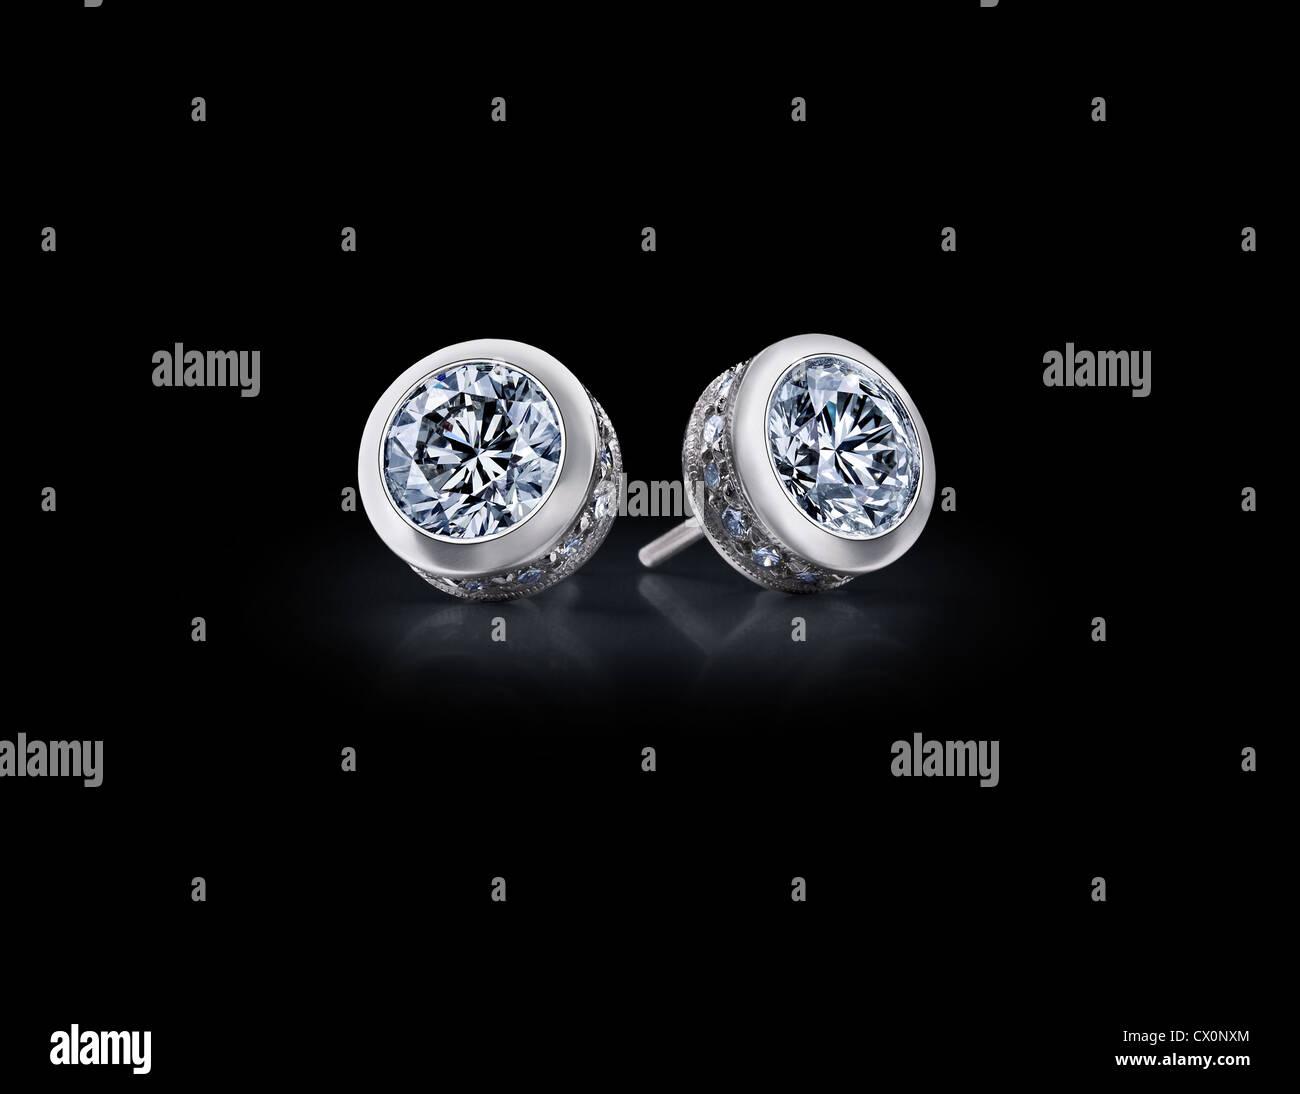 Diamond Earrings - Stock Image